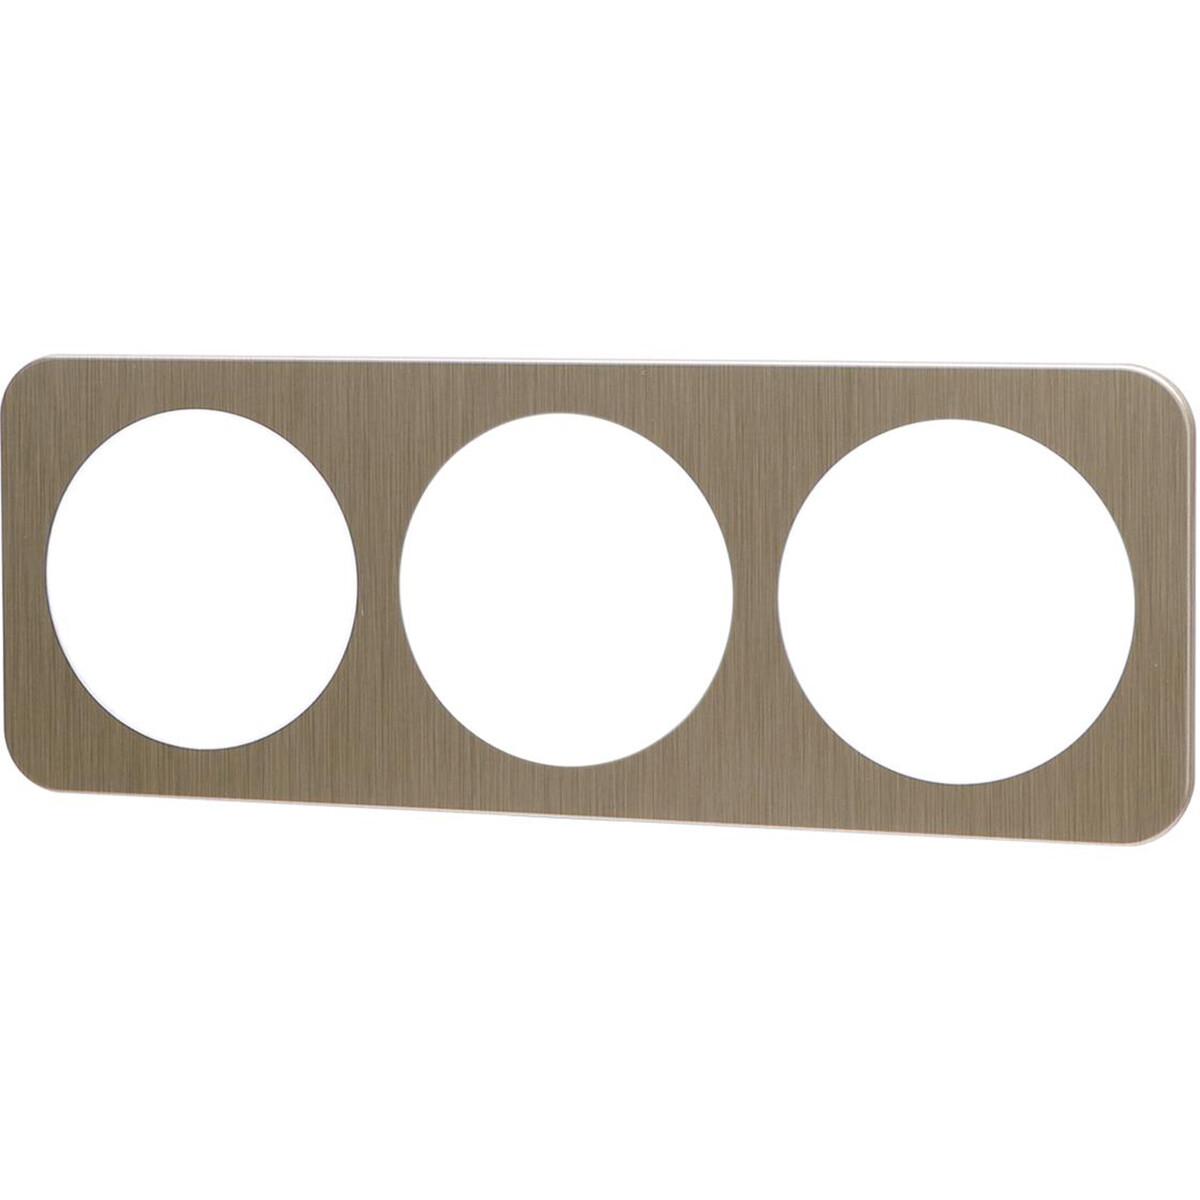 Afdekraam - Aigi Jura - 3-voudig - Rond - Aluminium - Goud